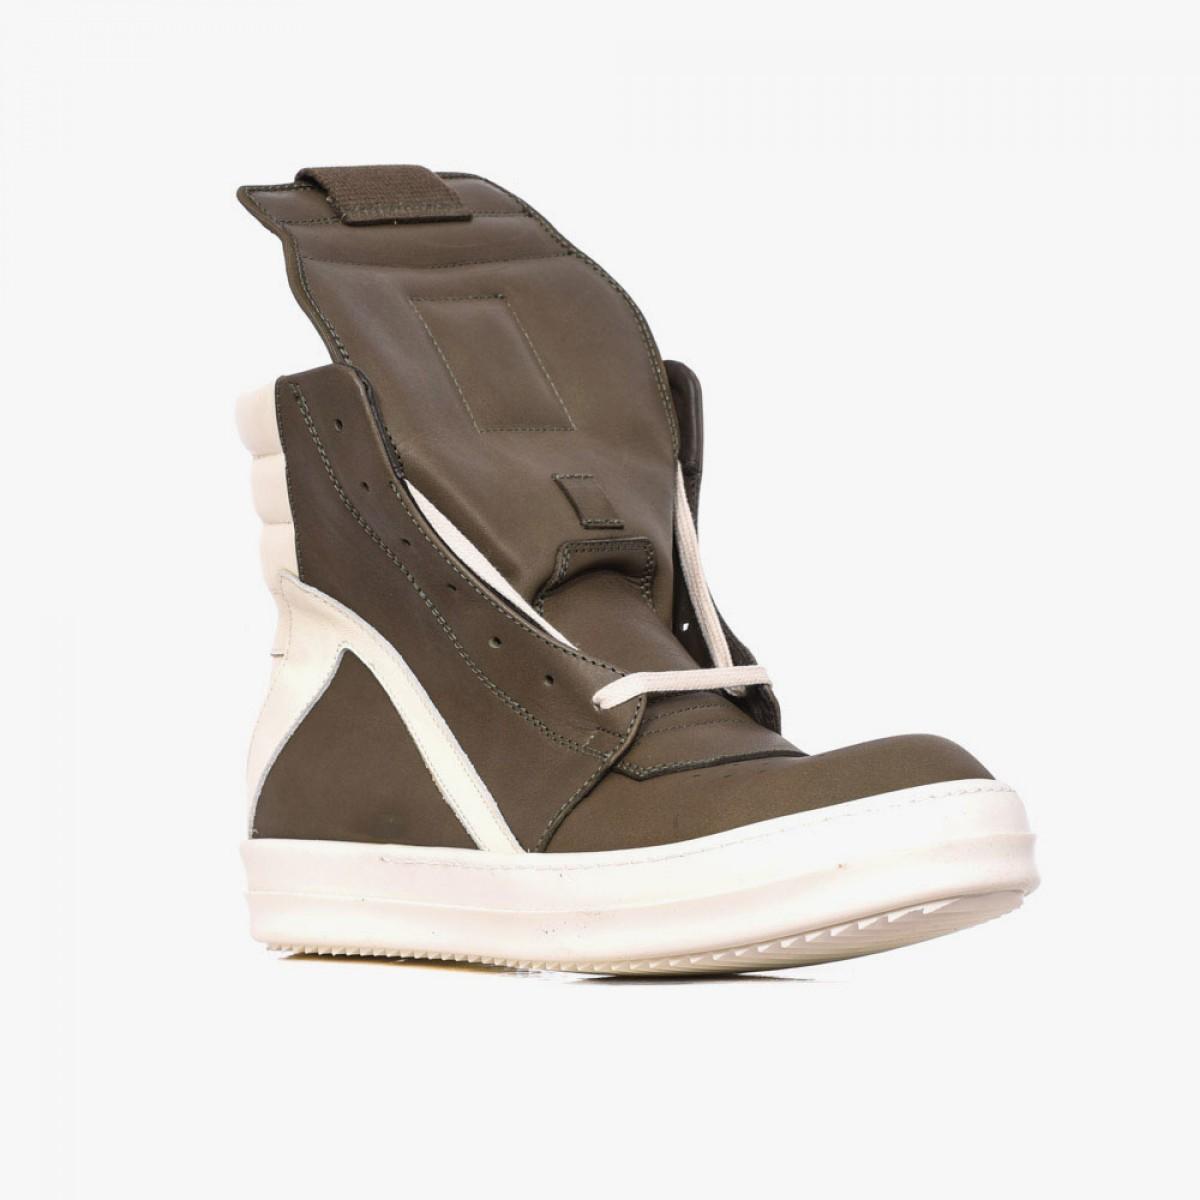 rick owens geobasket leather high top sneakers in brown for men lyst. Black Bedroom Furniture Sets. Home Design Ideas